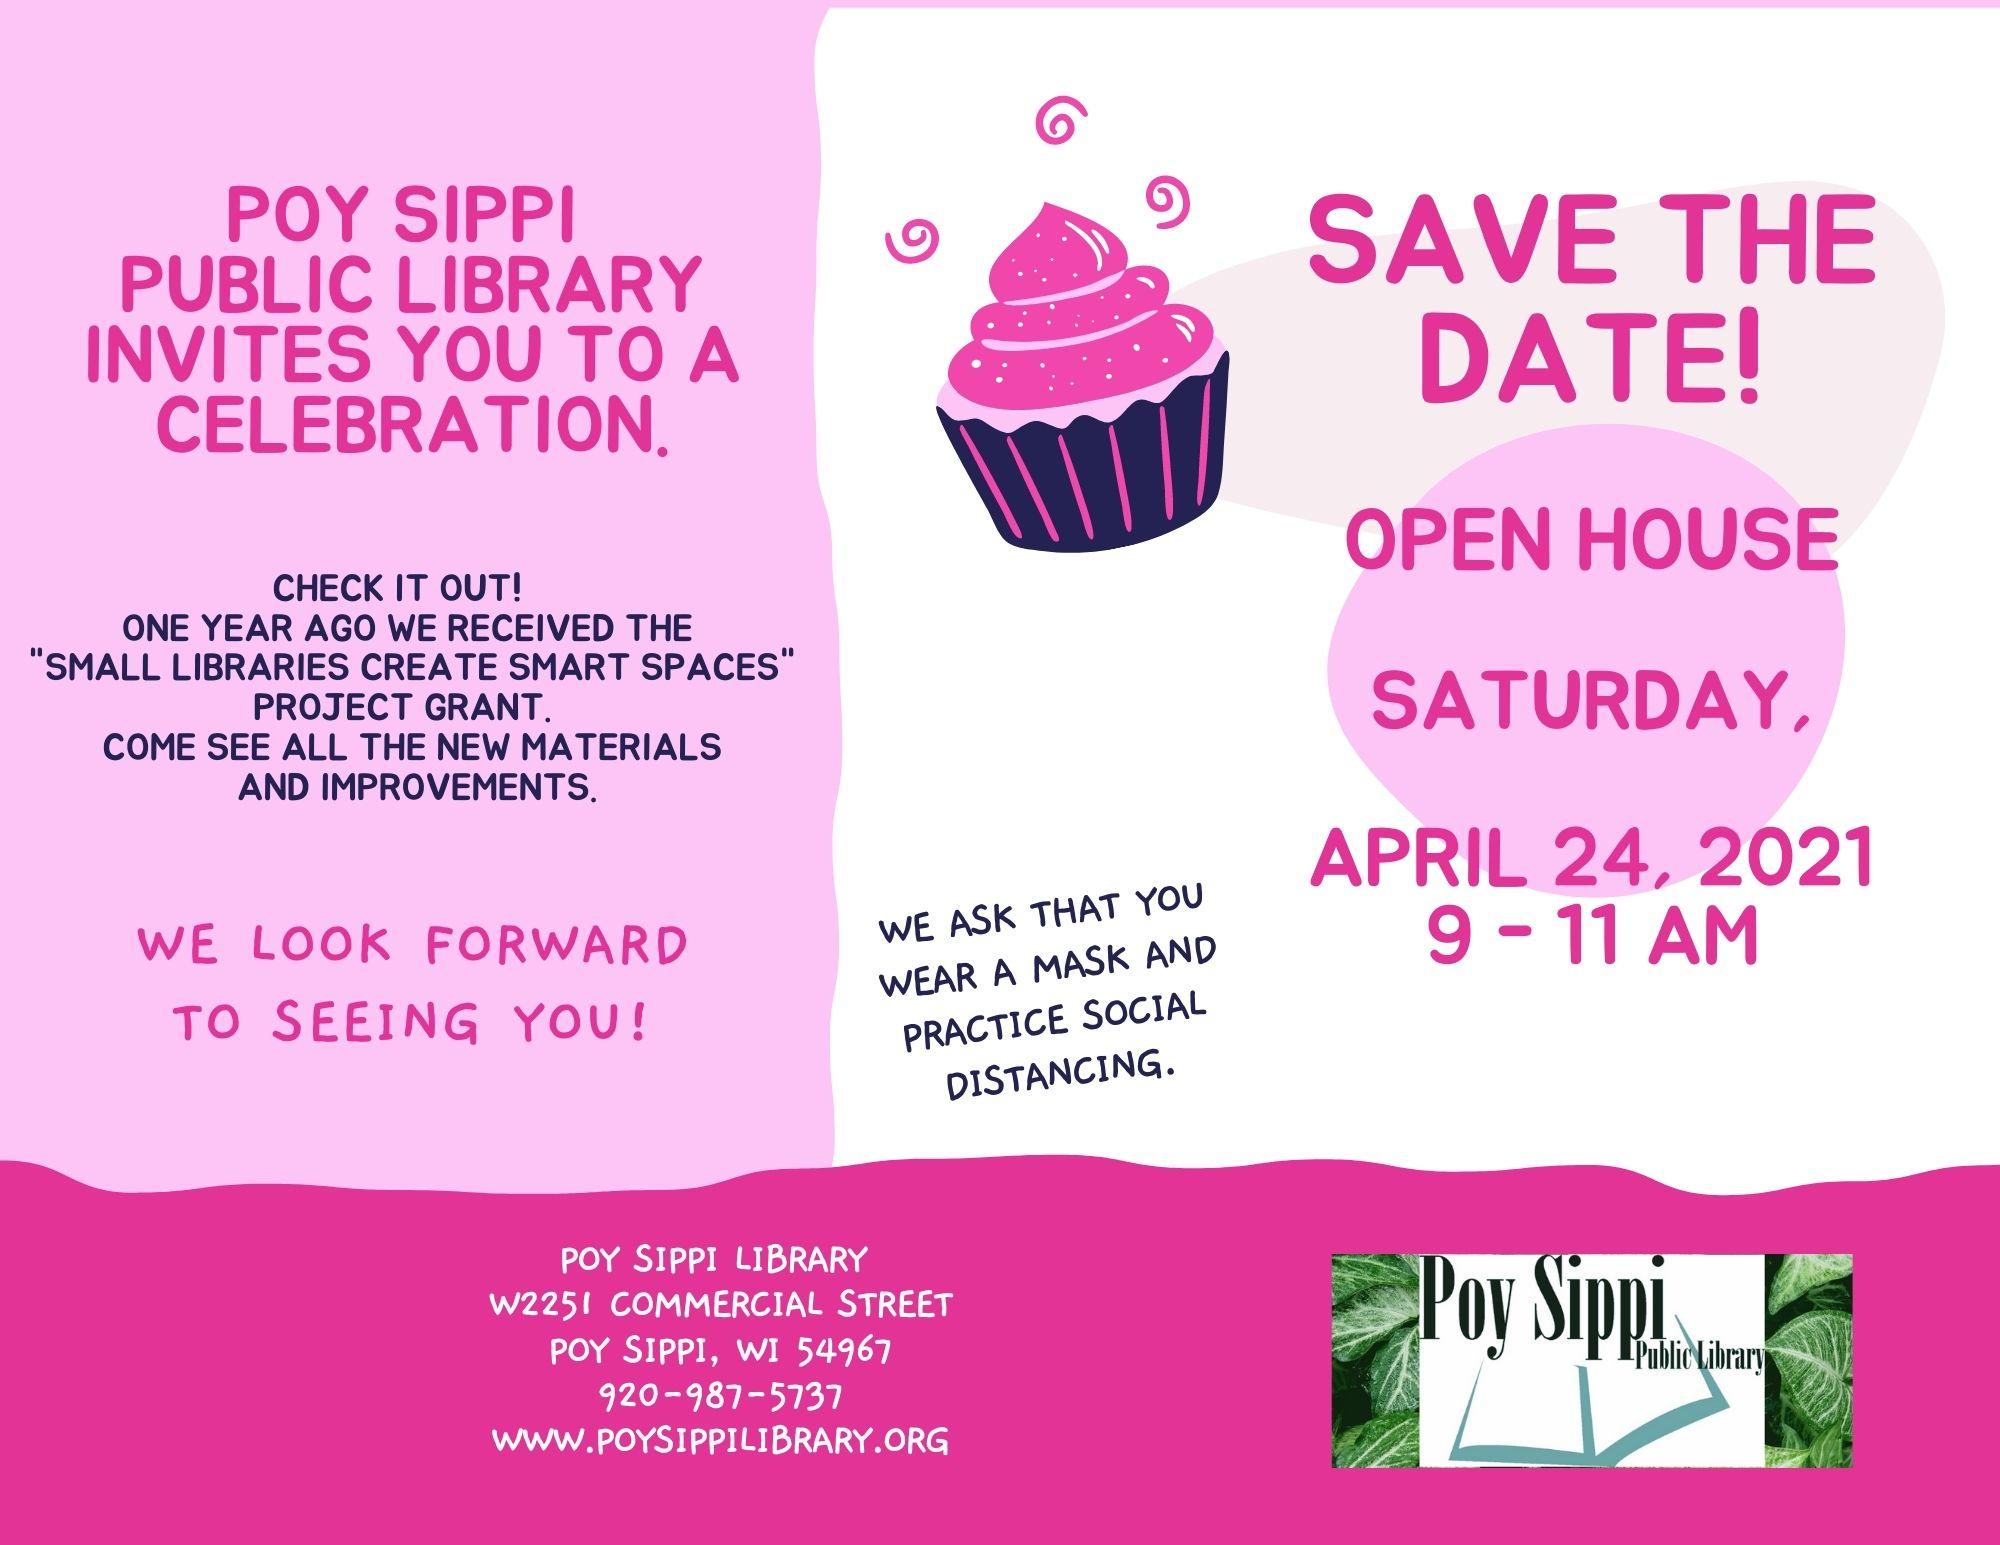 A Celebration Saturday, April 24, 2021 - 9 to 11 AM